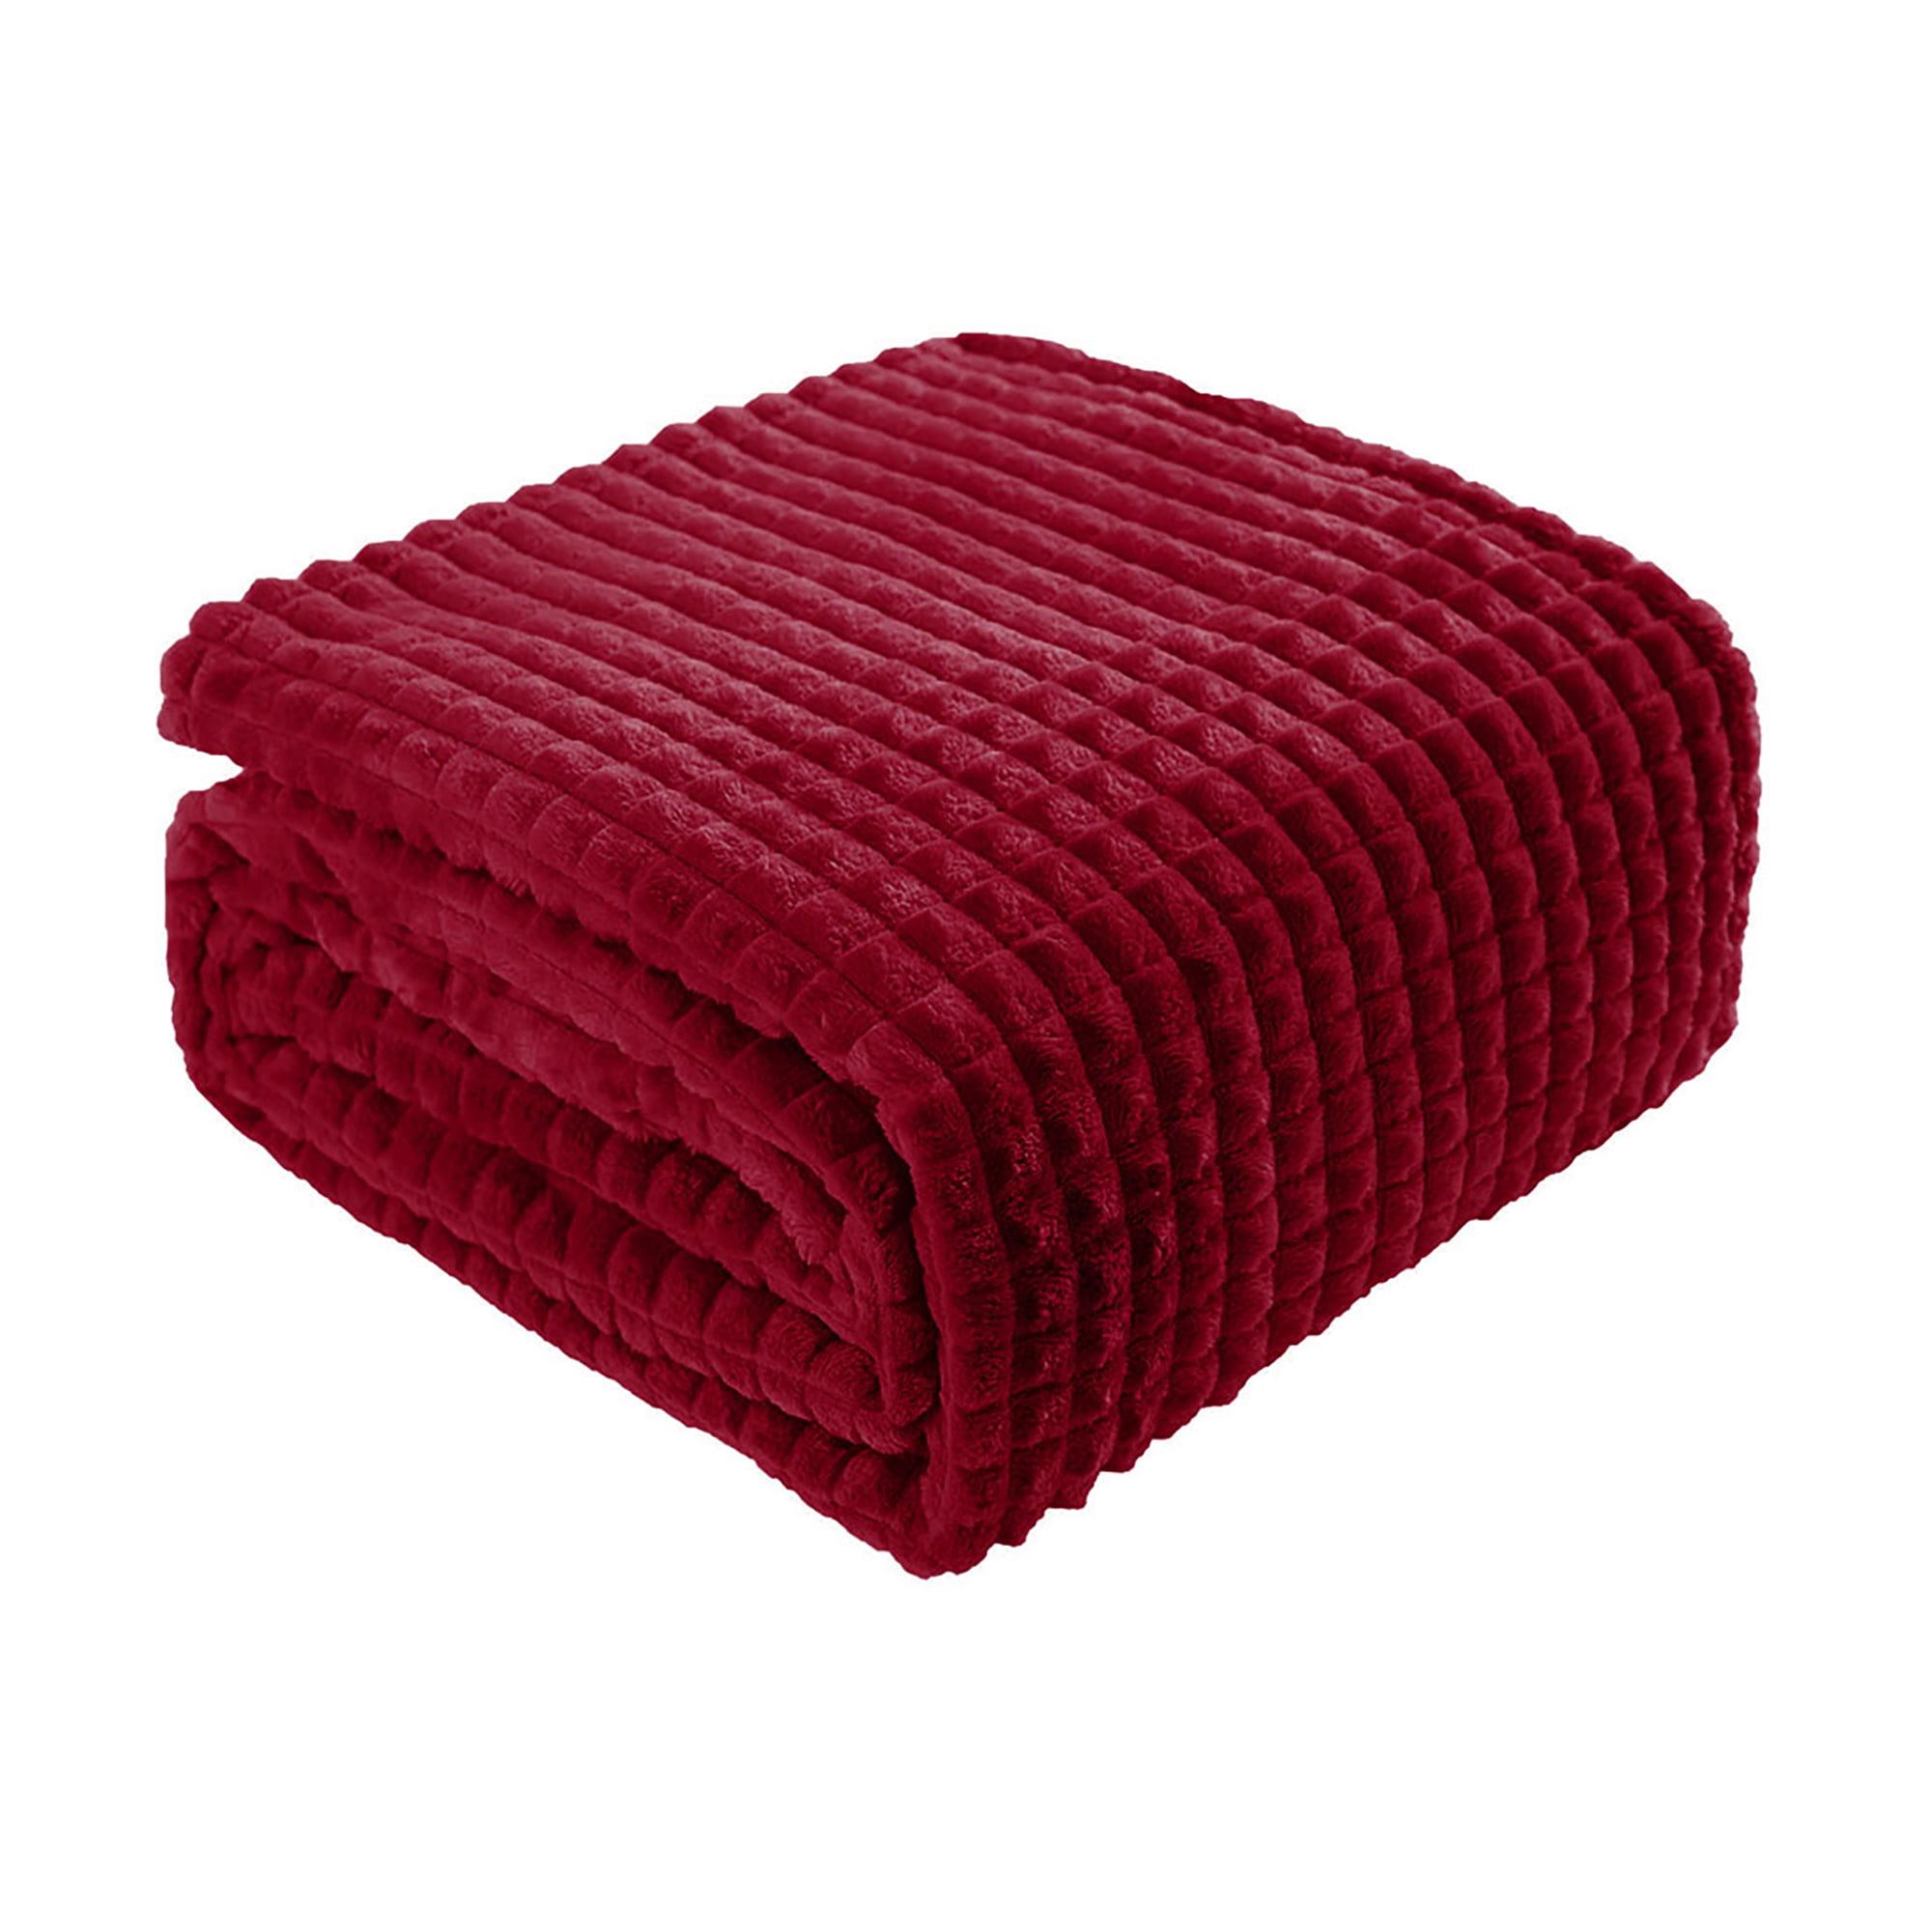 "Sofa Blanket Refined Craft Plaid Flannel Fleece Blanket Knee Blanket Wool Velvet- 60""x80"", Burgundy"